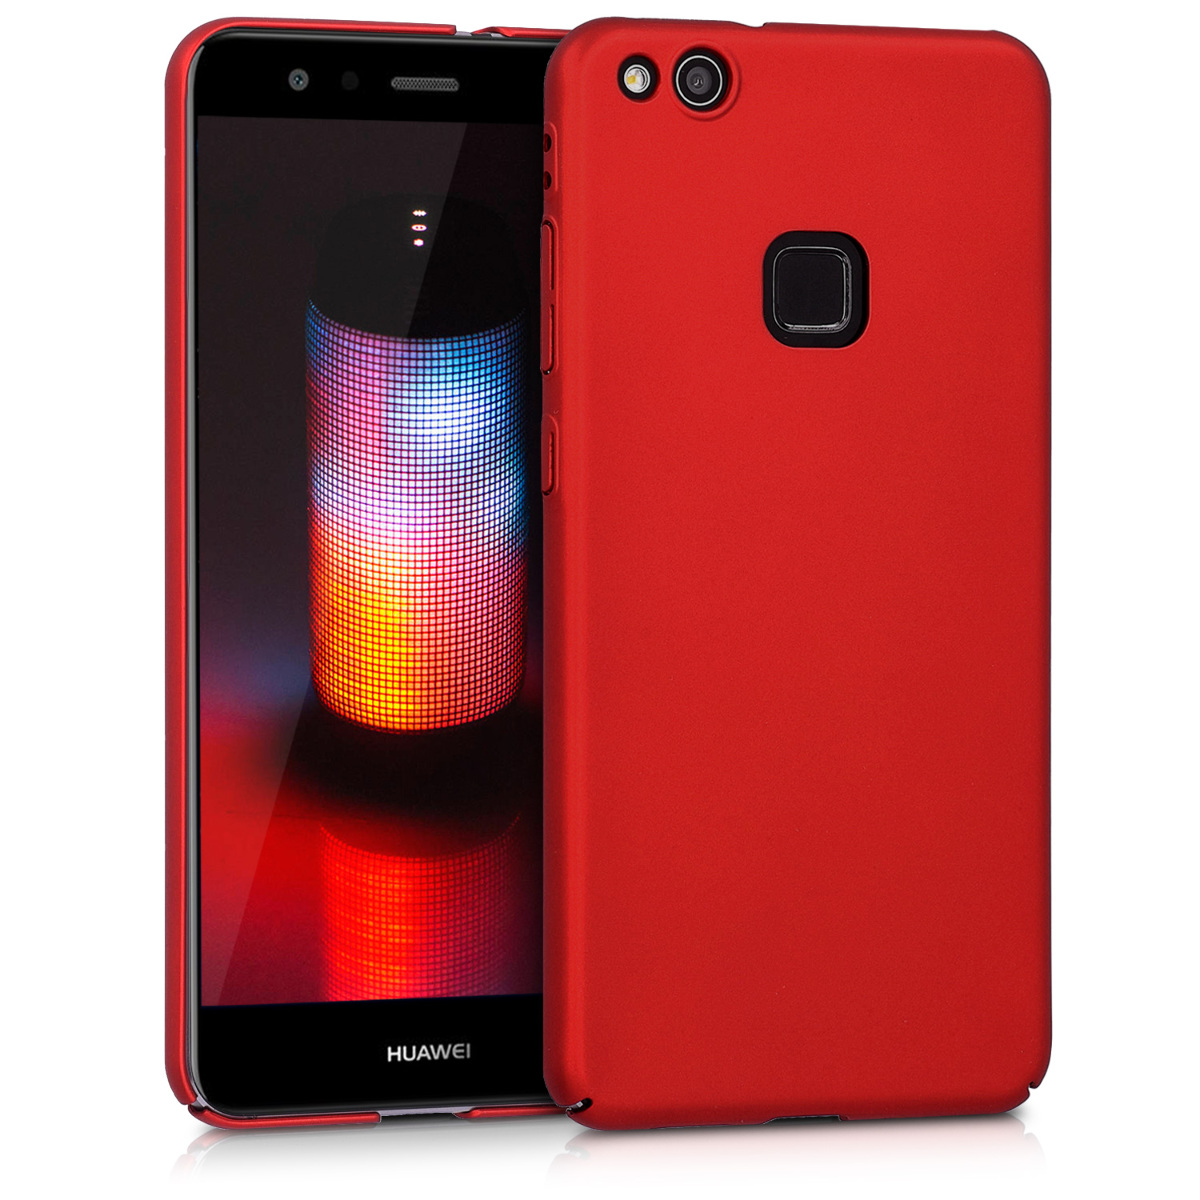 KW Slim Anti-Slip Cover - Σκληρή Θήκη Καουτσούκ Huawei P10 Lite - Κόκκινο μεταλλικό (42370.36)